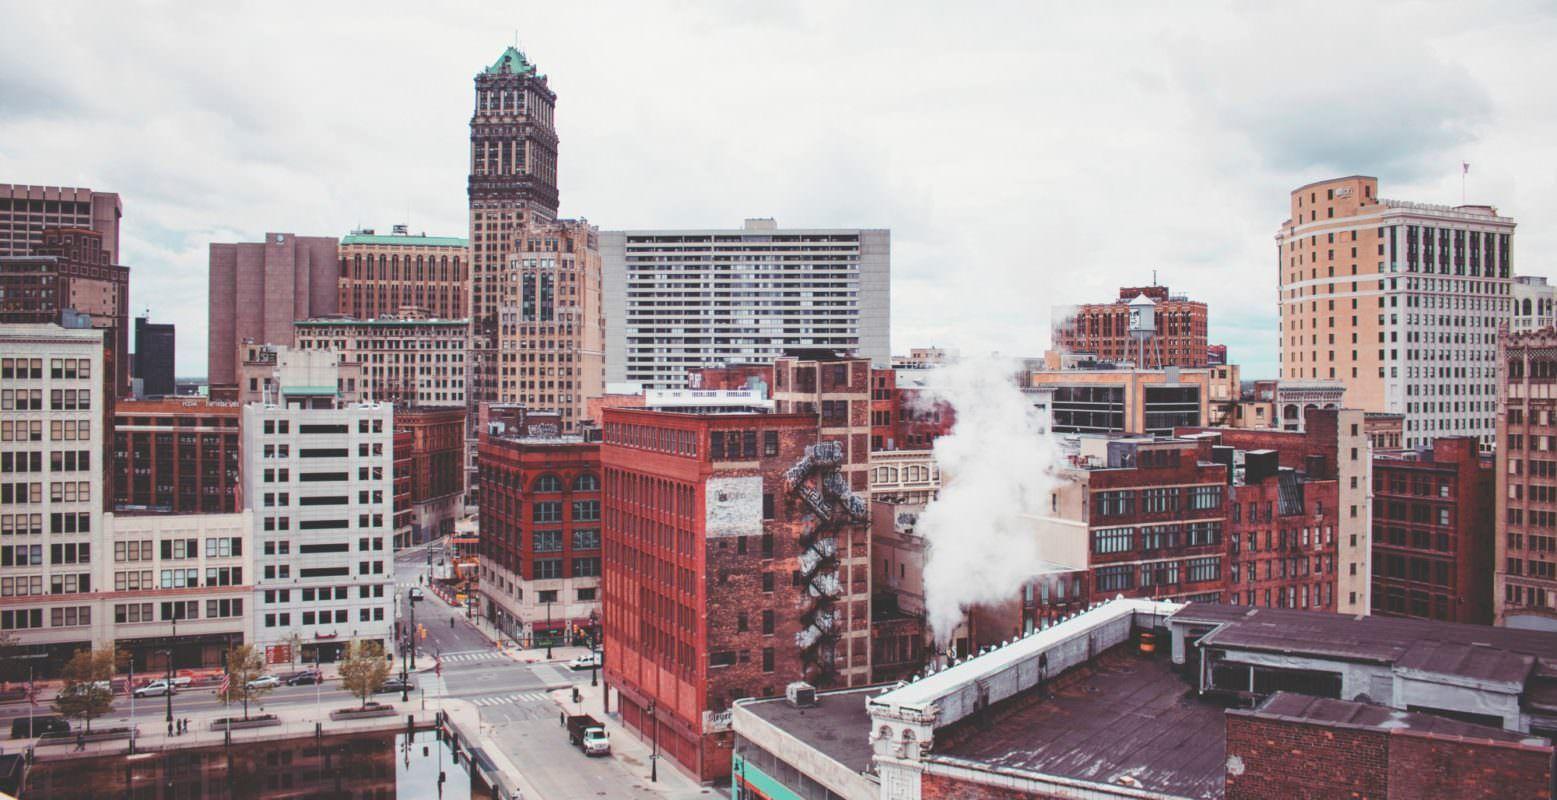 Michigan cannabis dispensaries, MI regulators set to close about 50 unlicensed medical marijuana shops in April